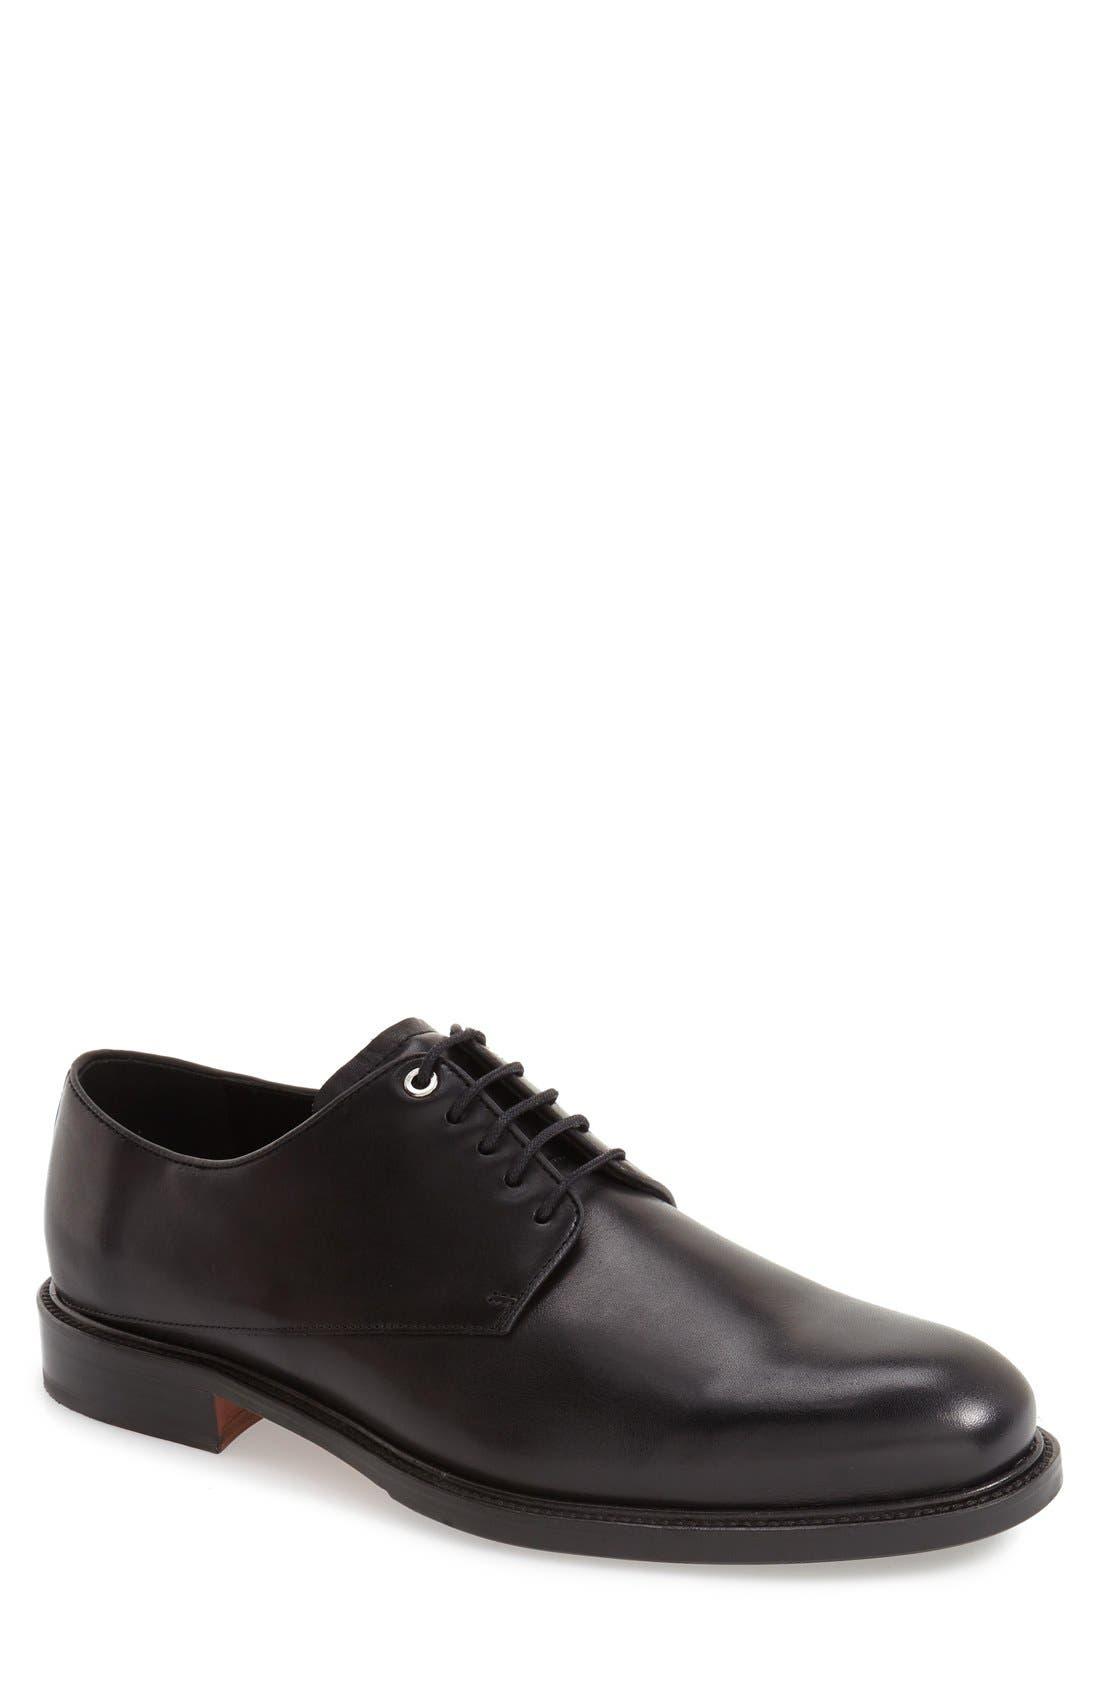 'Benson' Plain Toe Derby,                             Main thumbnail 1, color,                             Box Black Leather